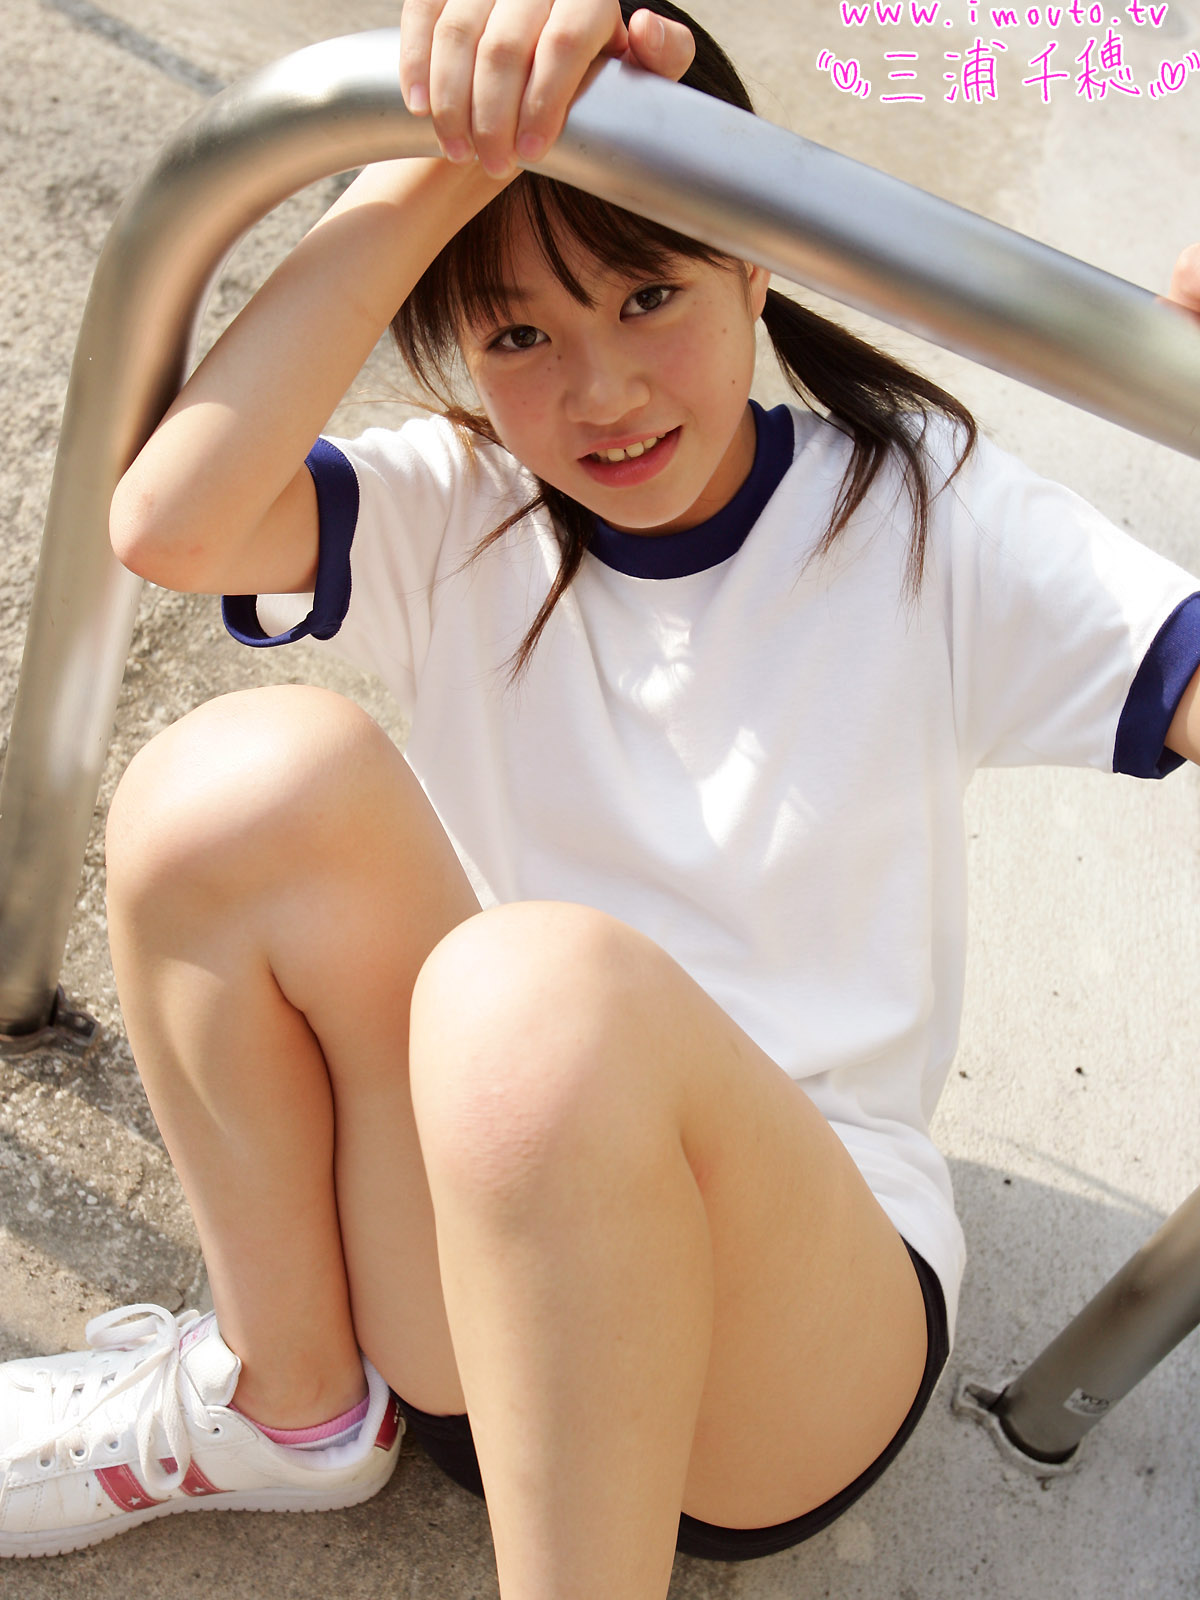 u15 japanese naked U15 Junior Idol Japanese Gravure Idol Girls